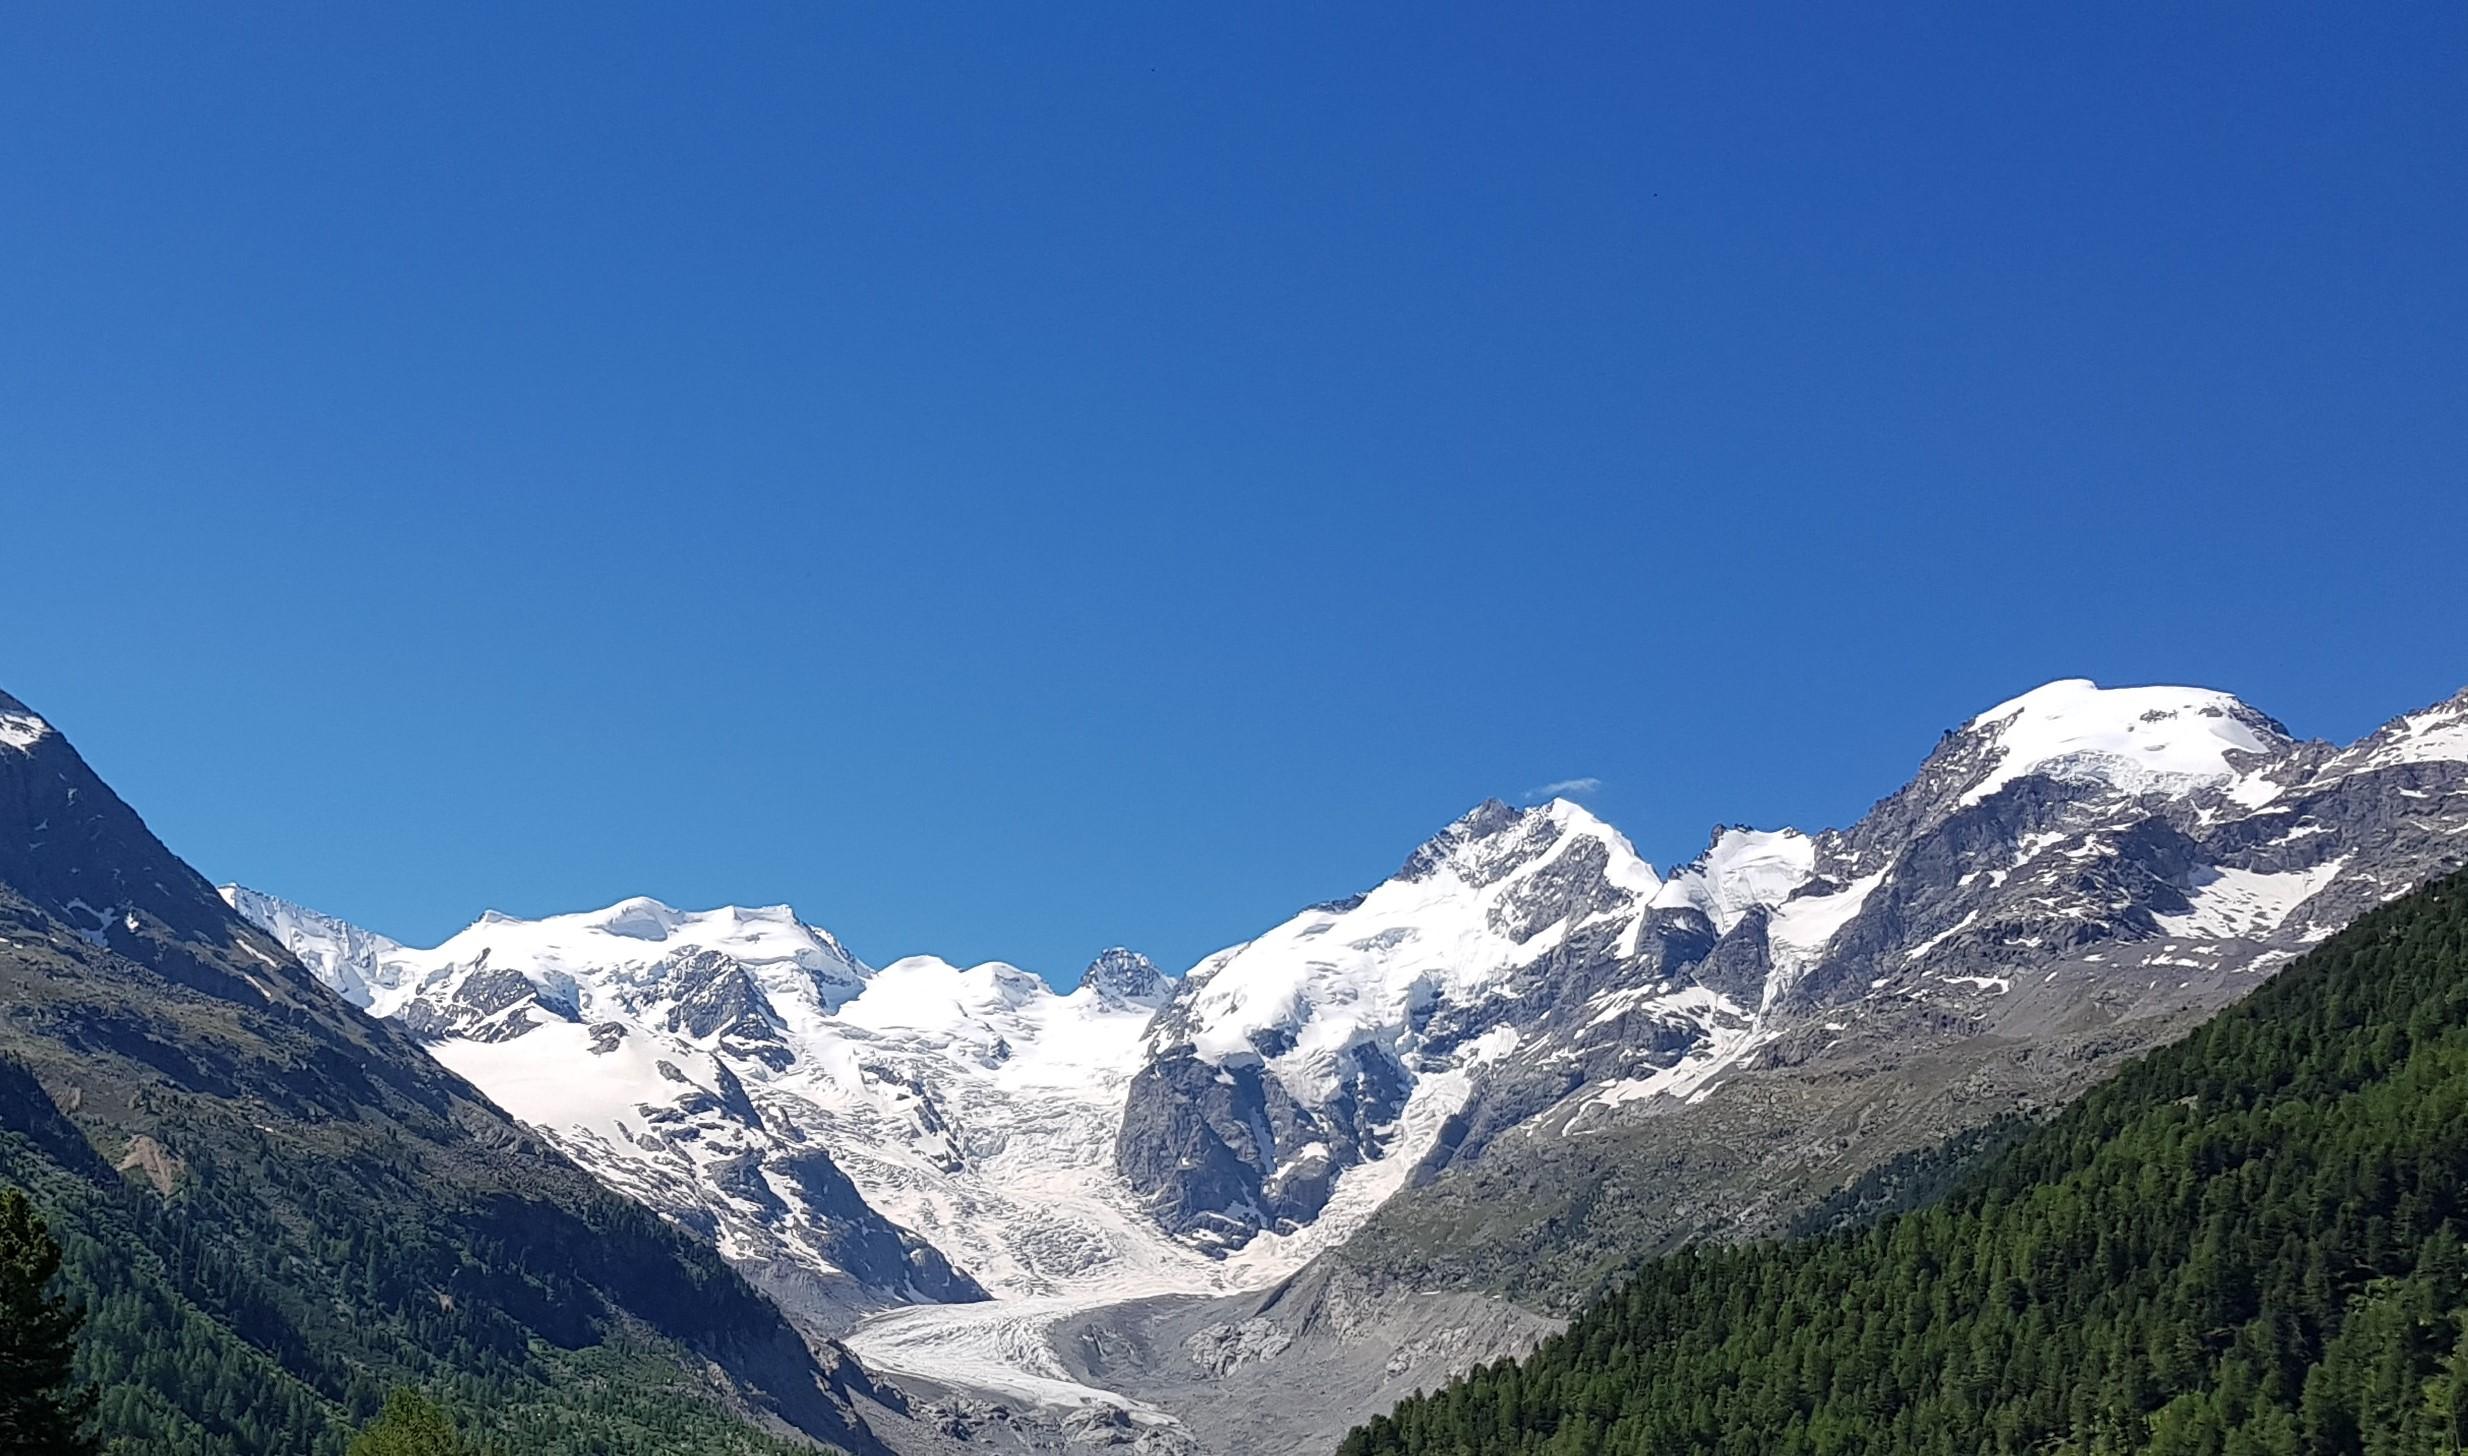 Engadine, Pontresina, Morteratsch, view on Morteratsch Glacier